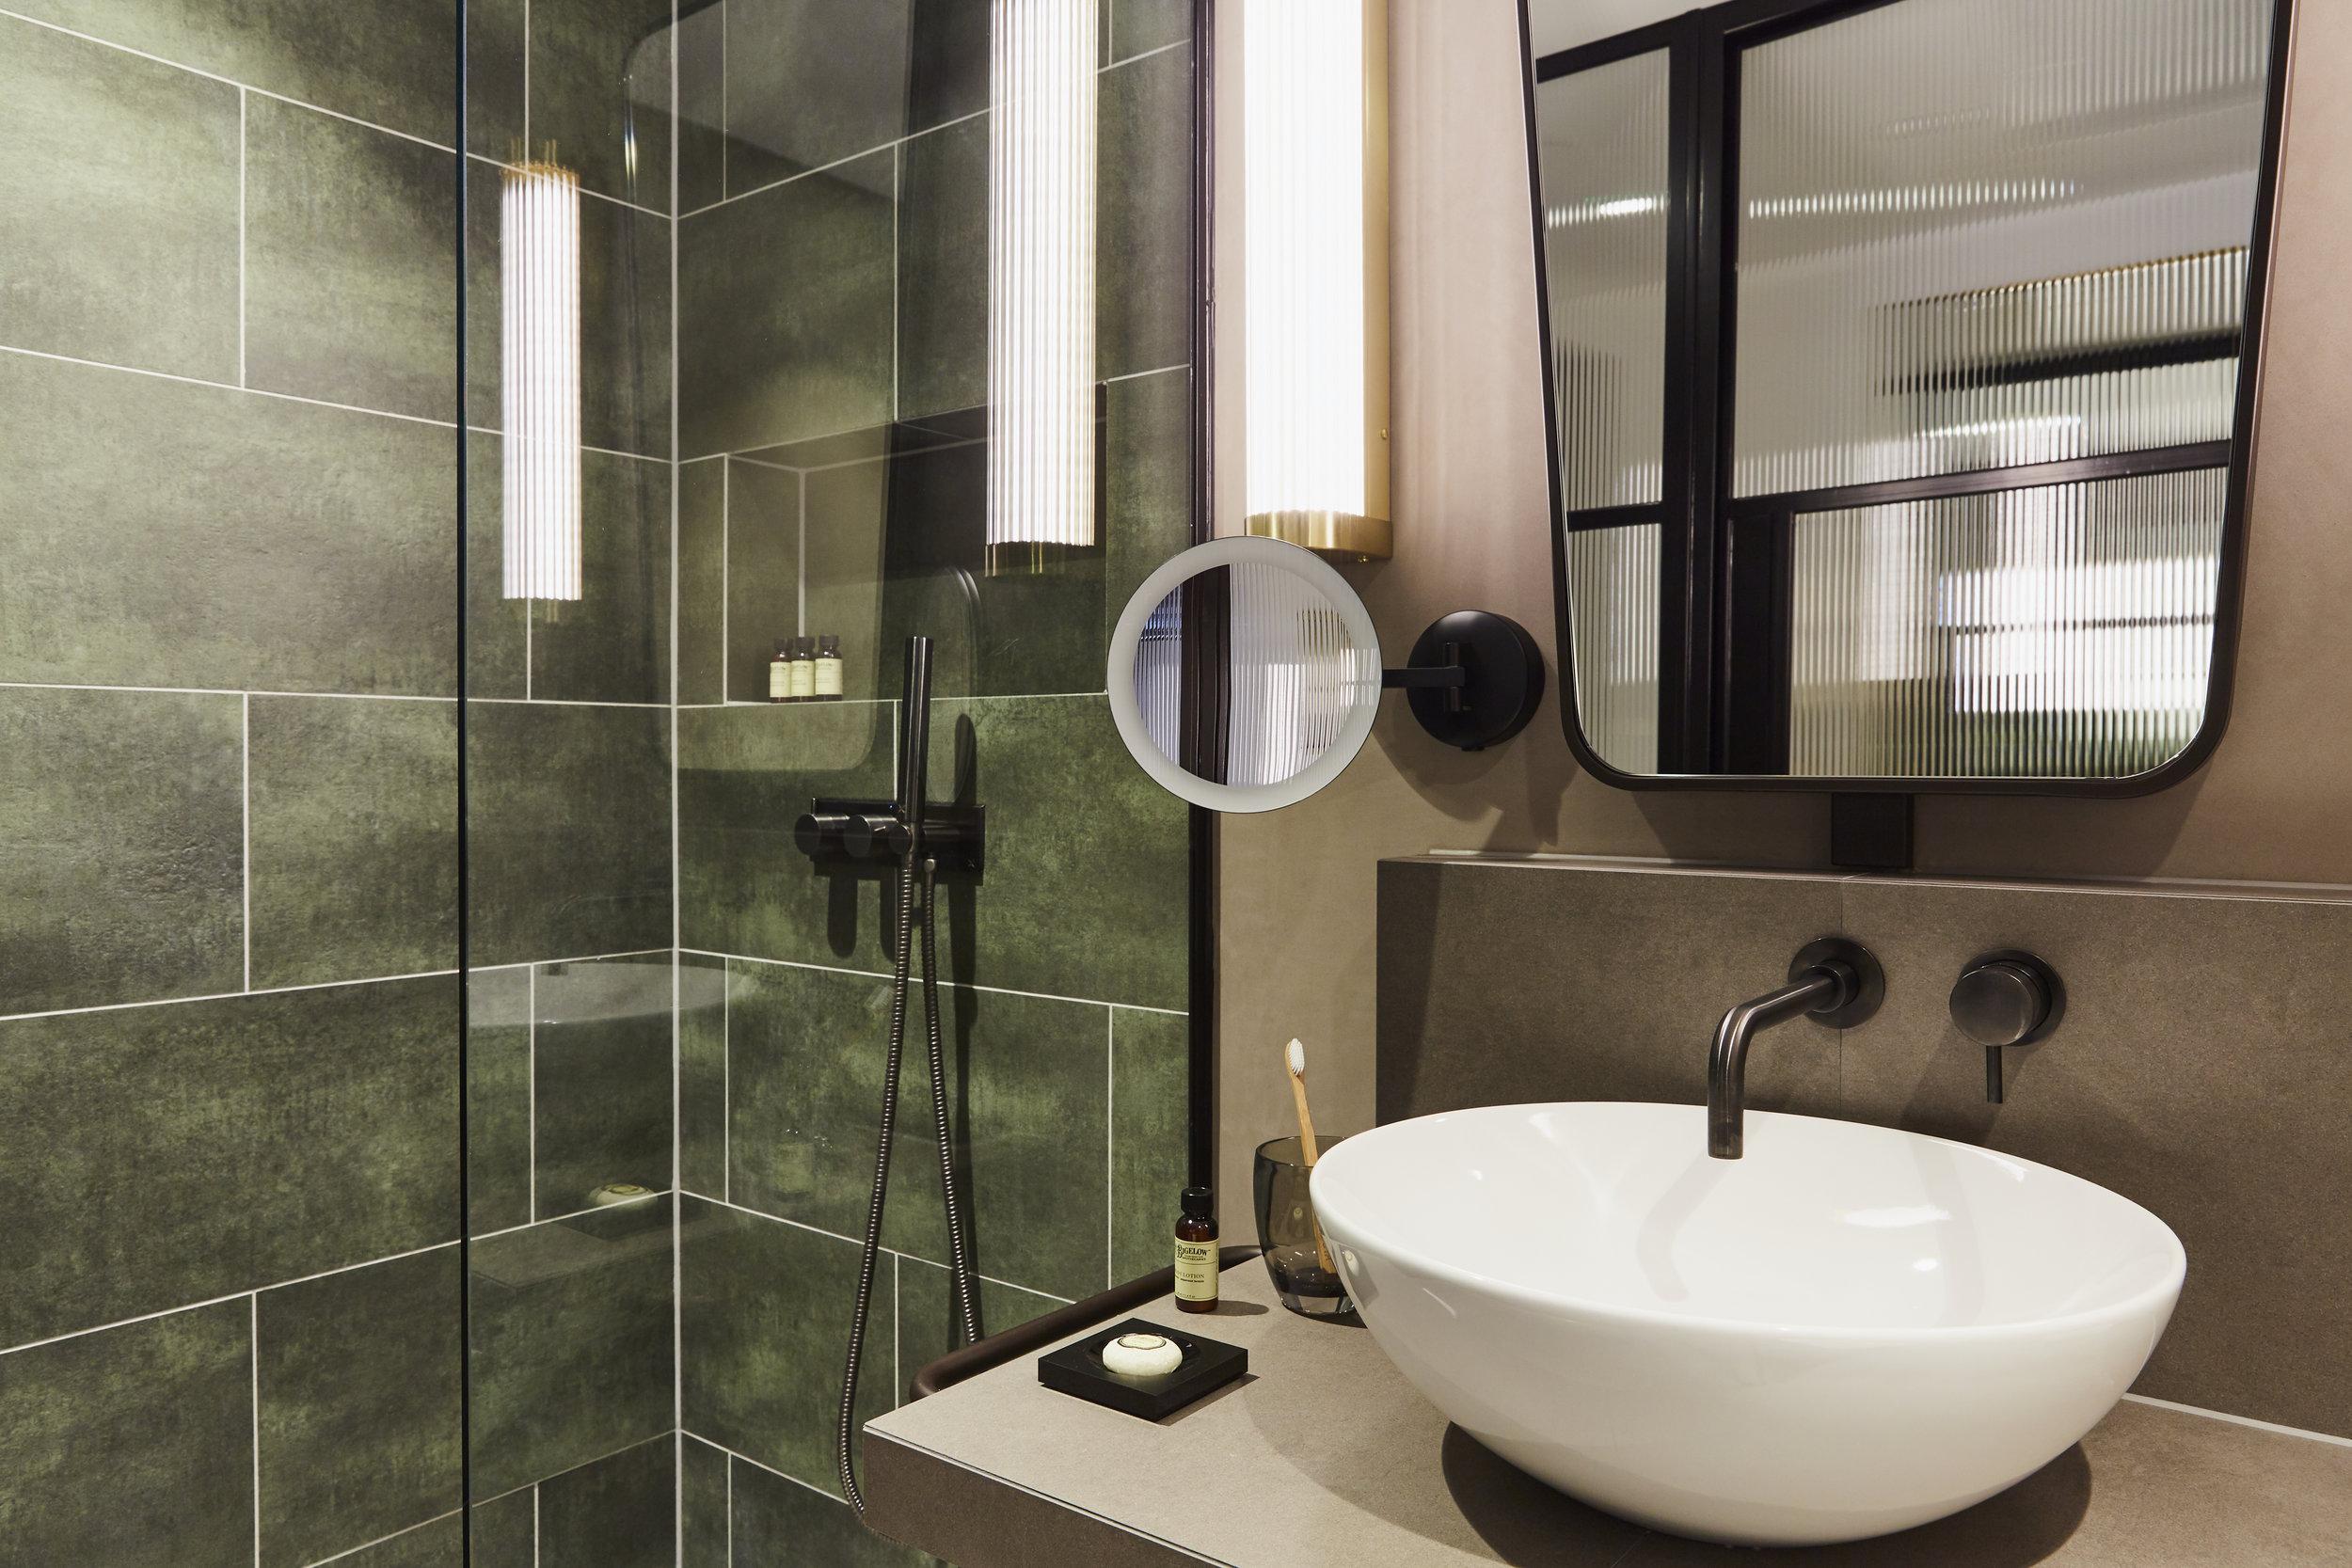 SUPERIOR ROOM LSQ VIEW BATHROOM.jpg